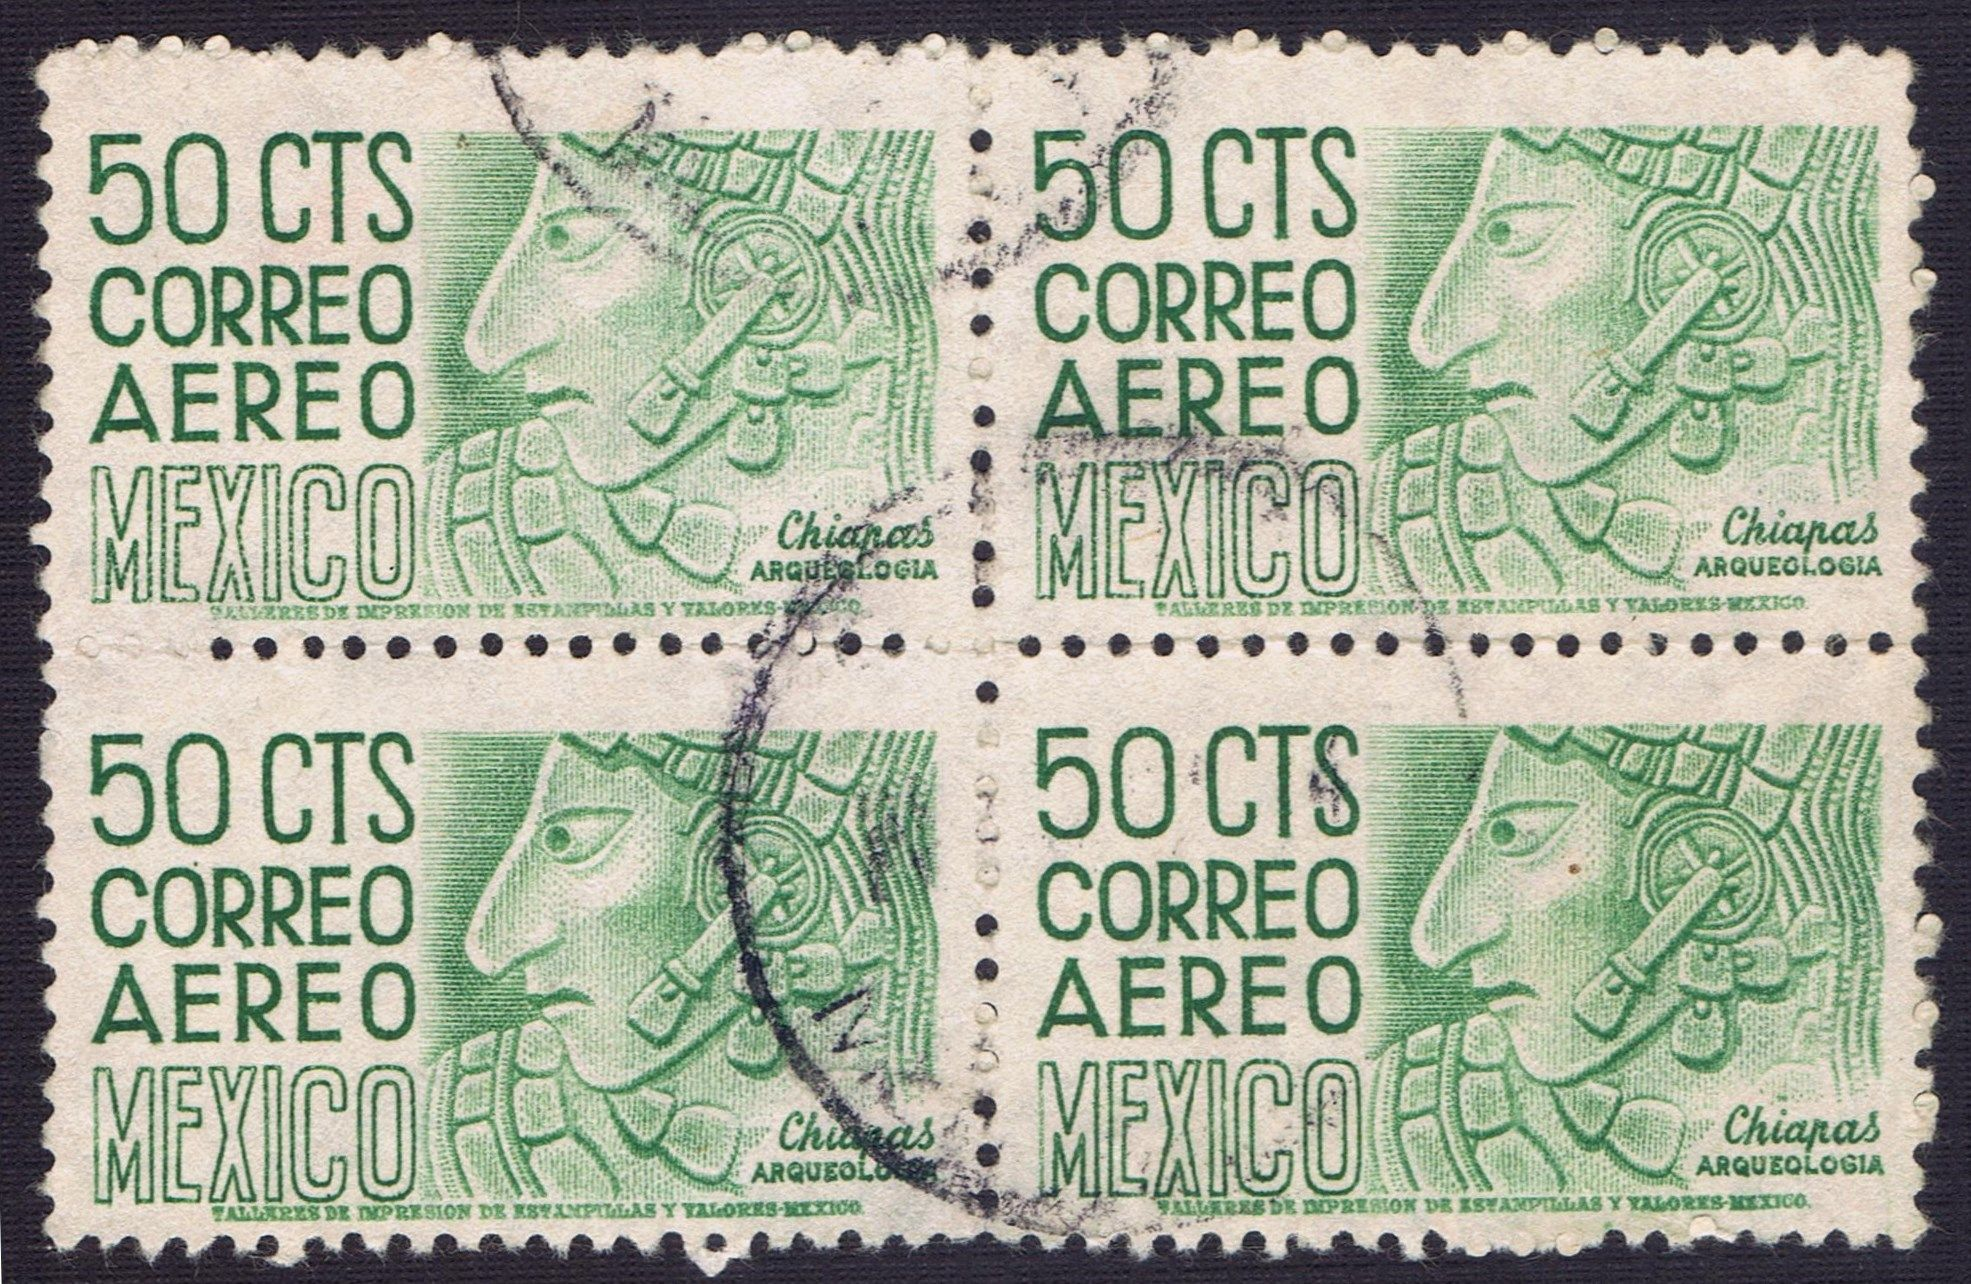 50 cts correo aereo mexico postage stamp chiapas for Correo postal mas cercano